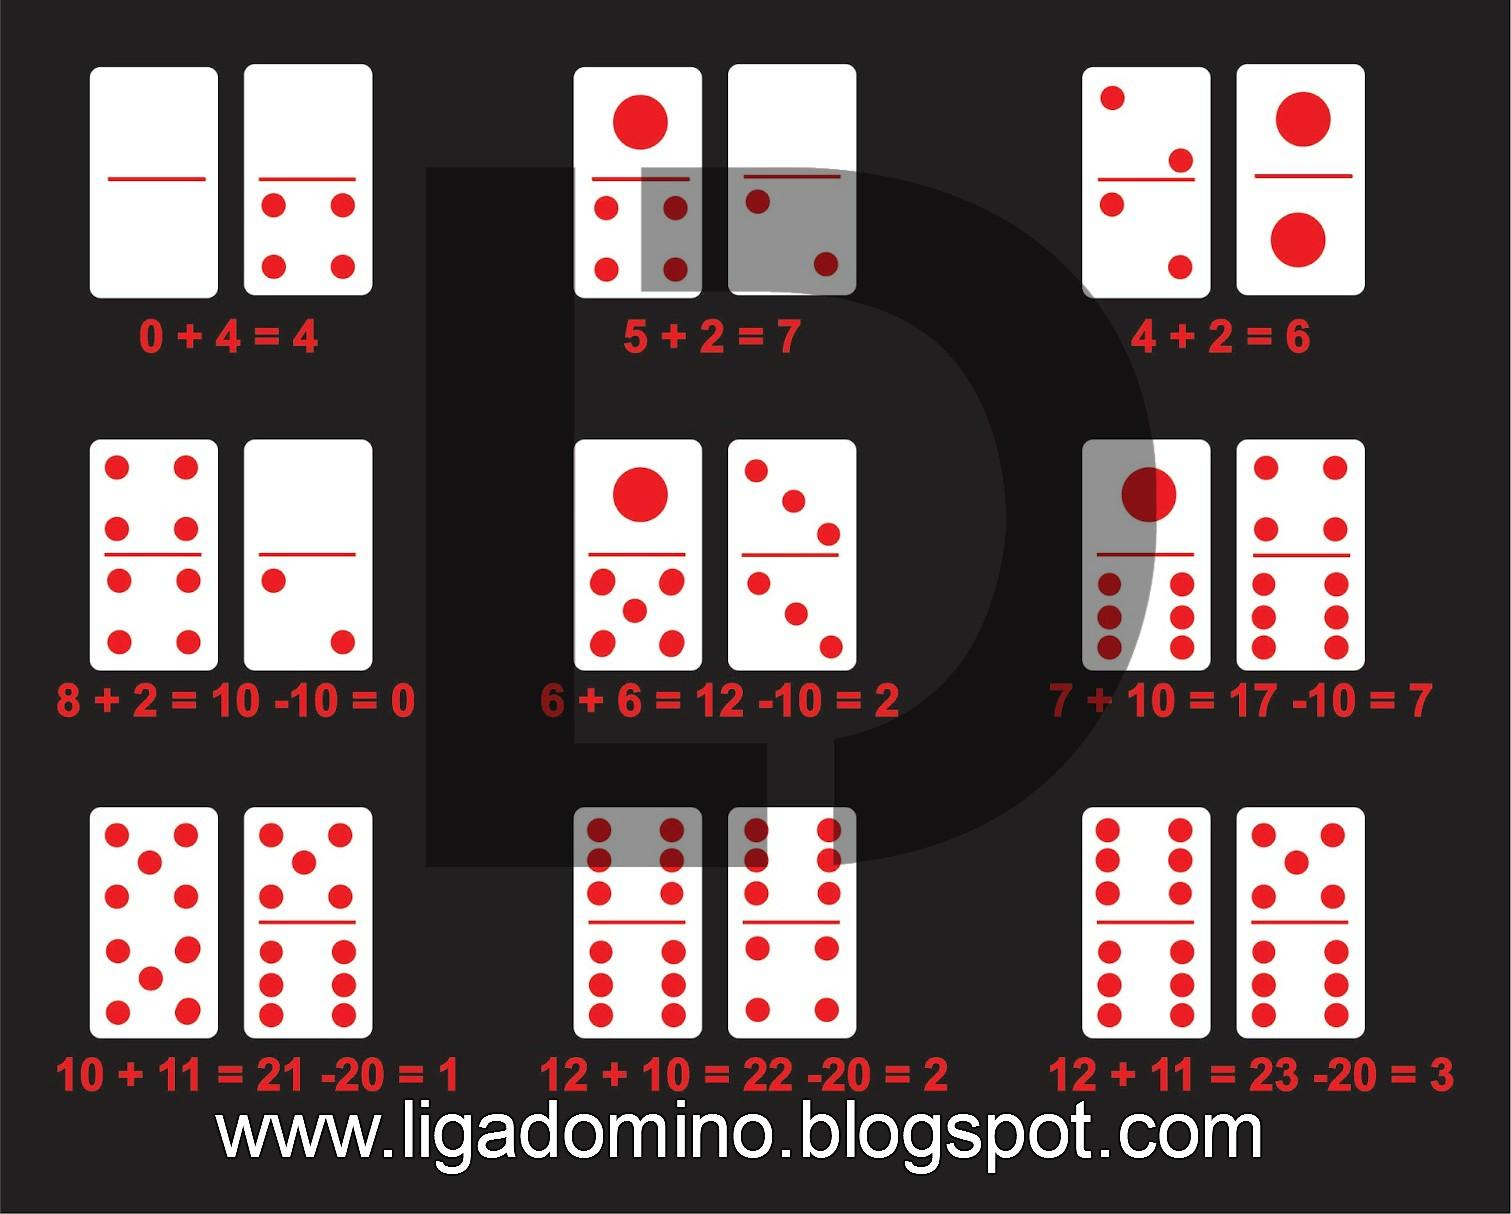 Ceme Tengah AduQ ~ Game Poker Domino Gaple